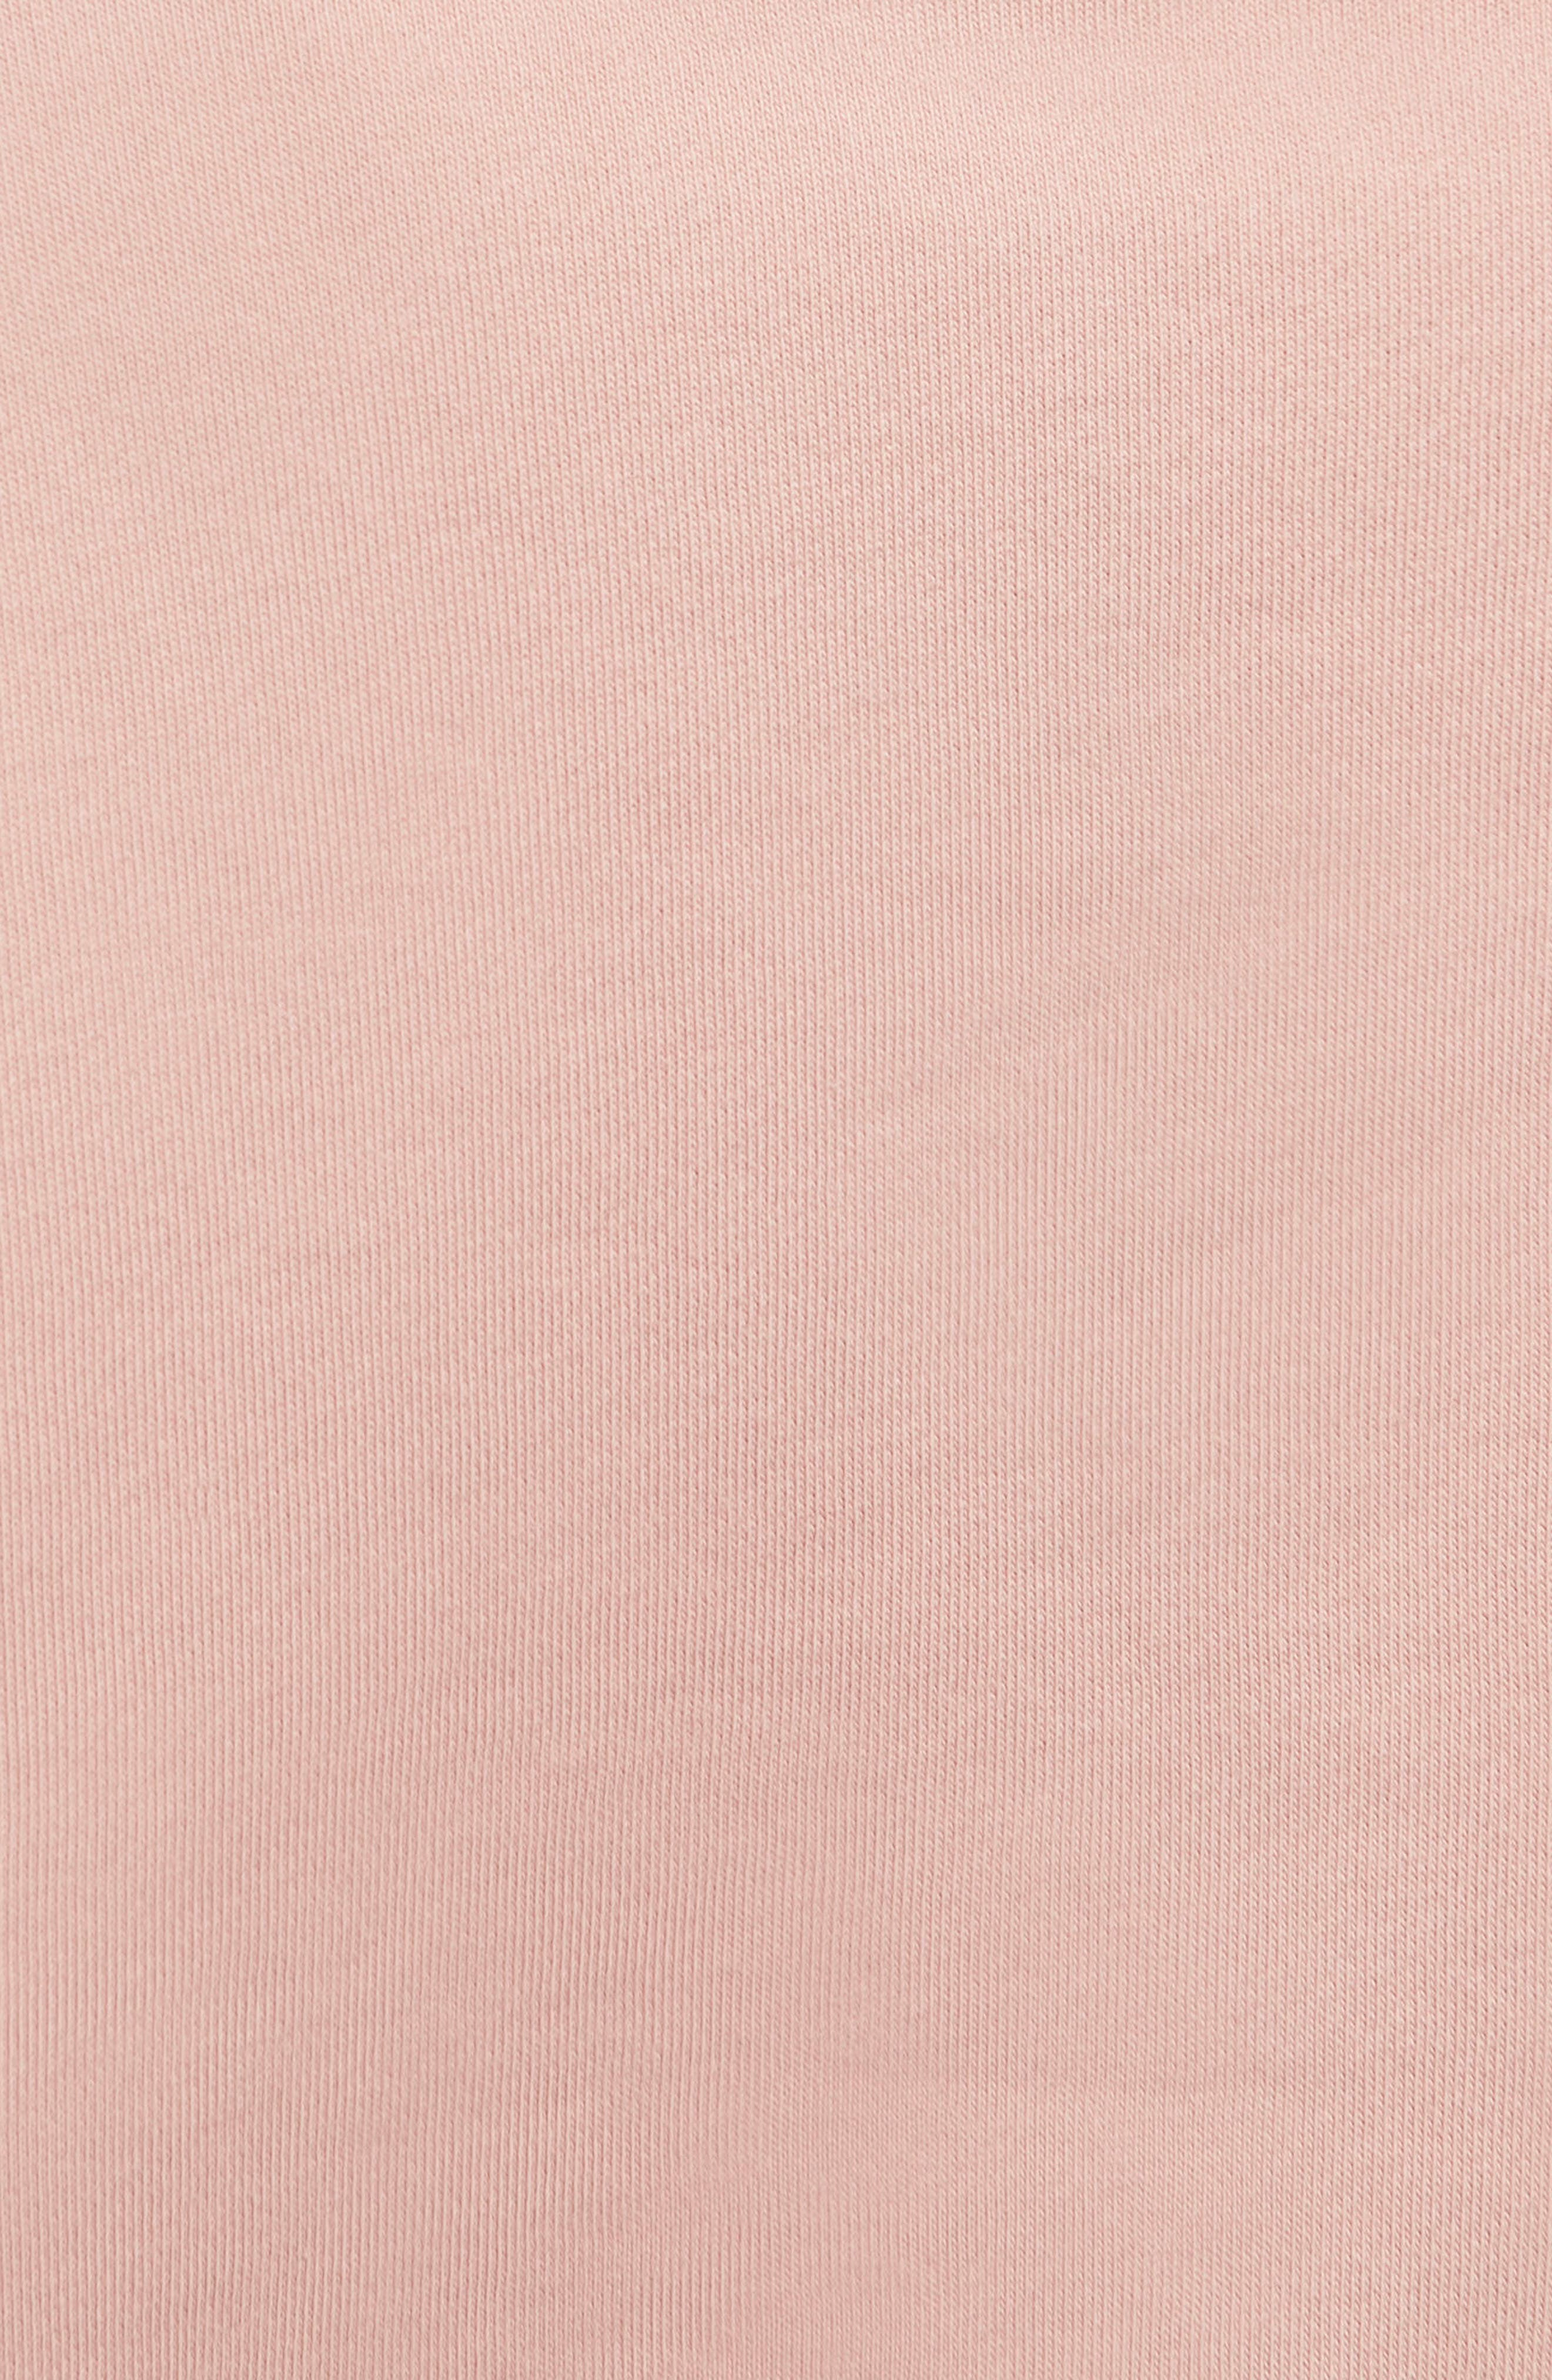 Albata Sweatshirt,                             Alternate thumbnail 4, color,                             650